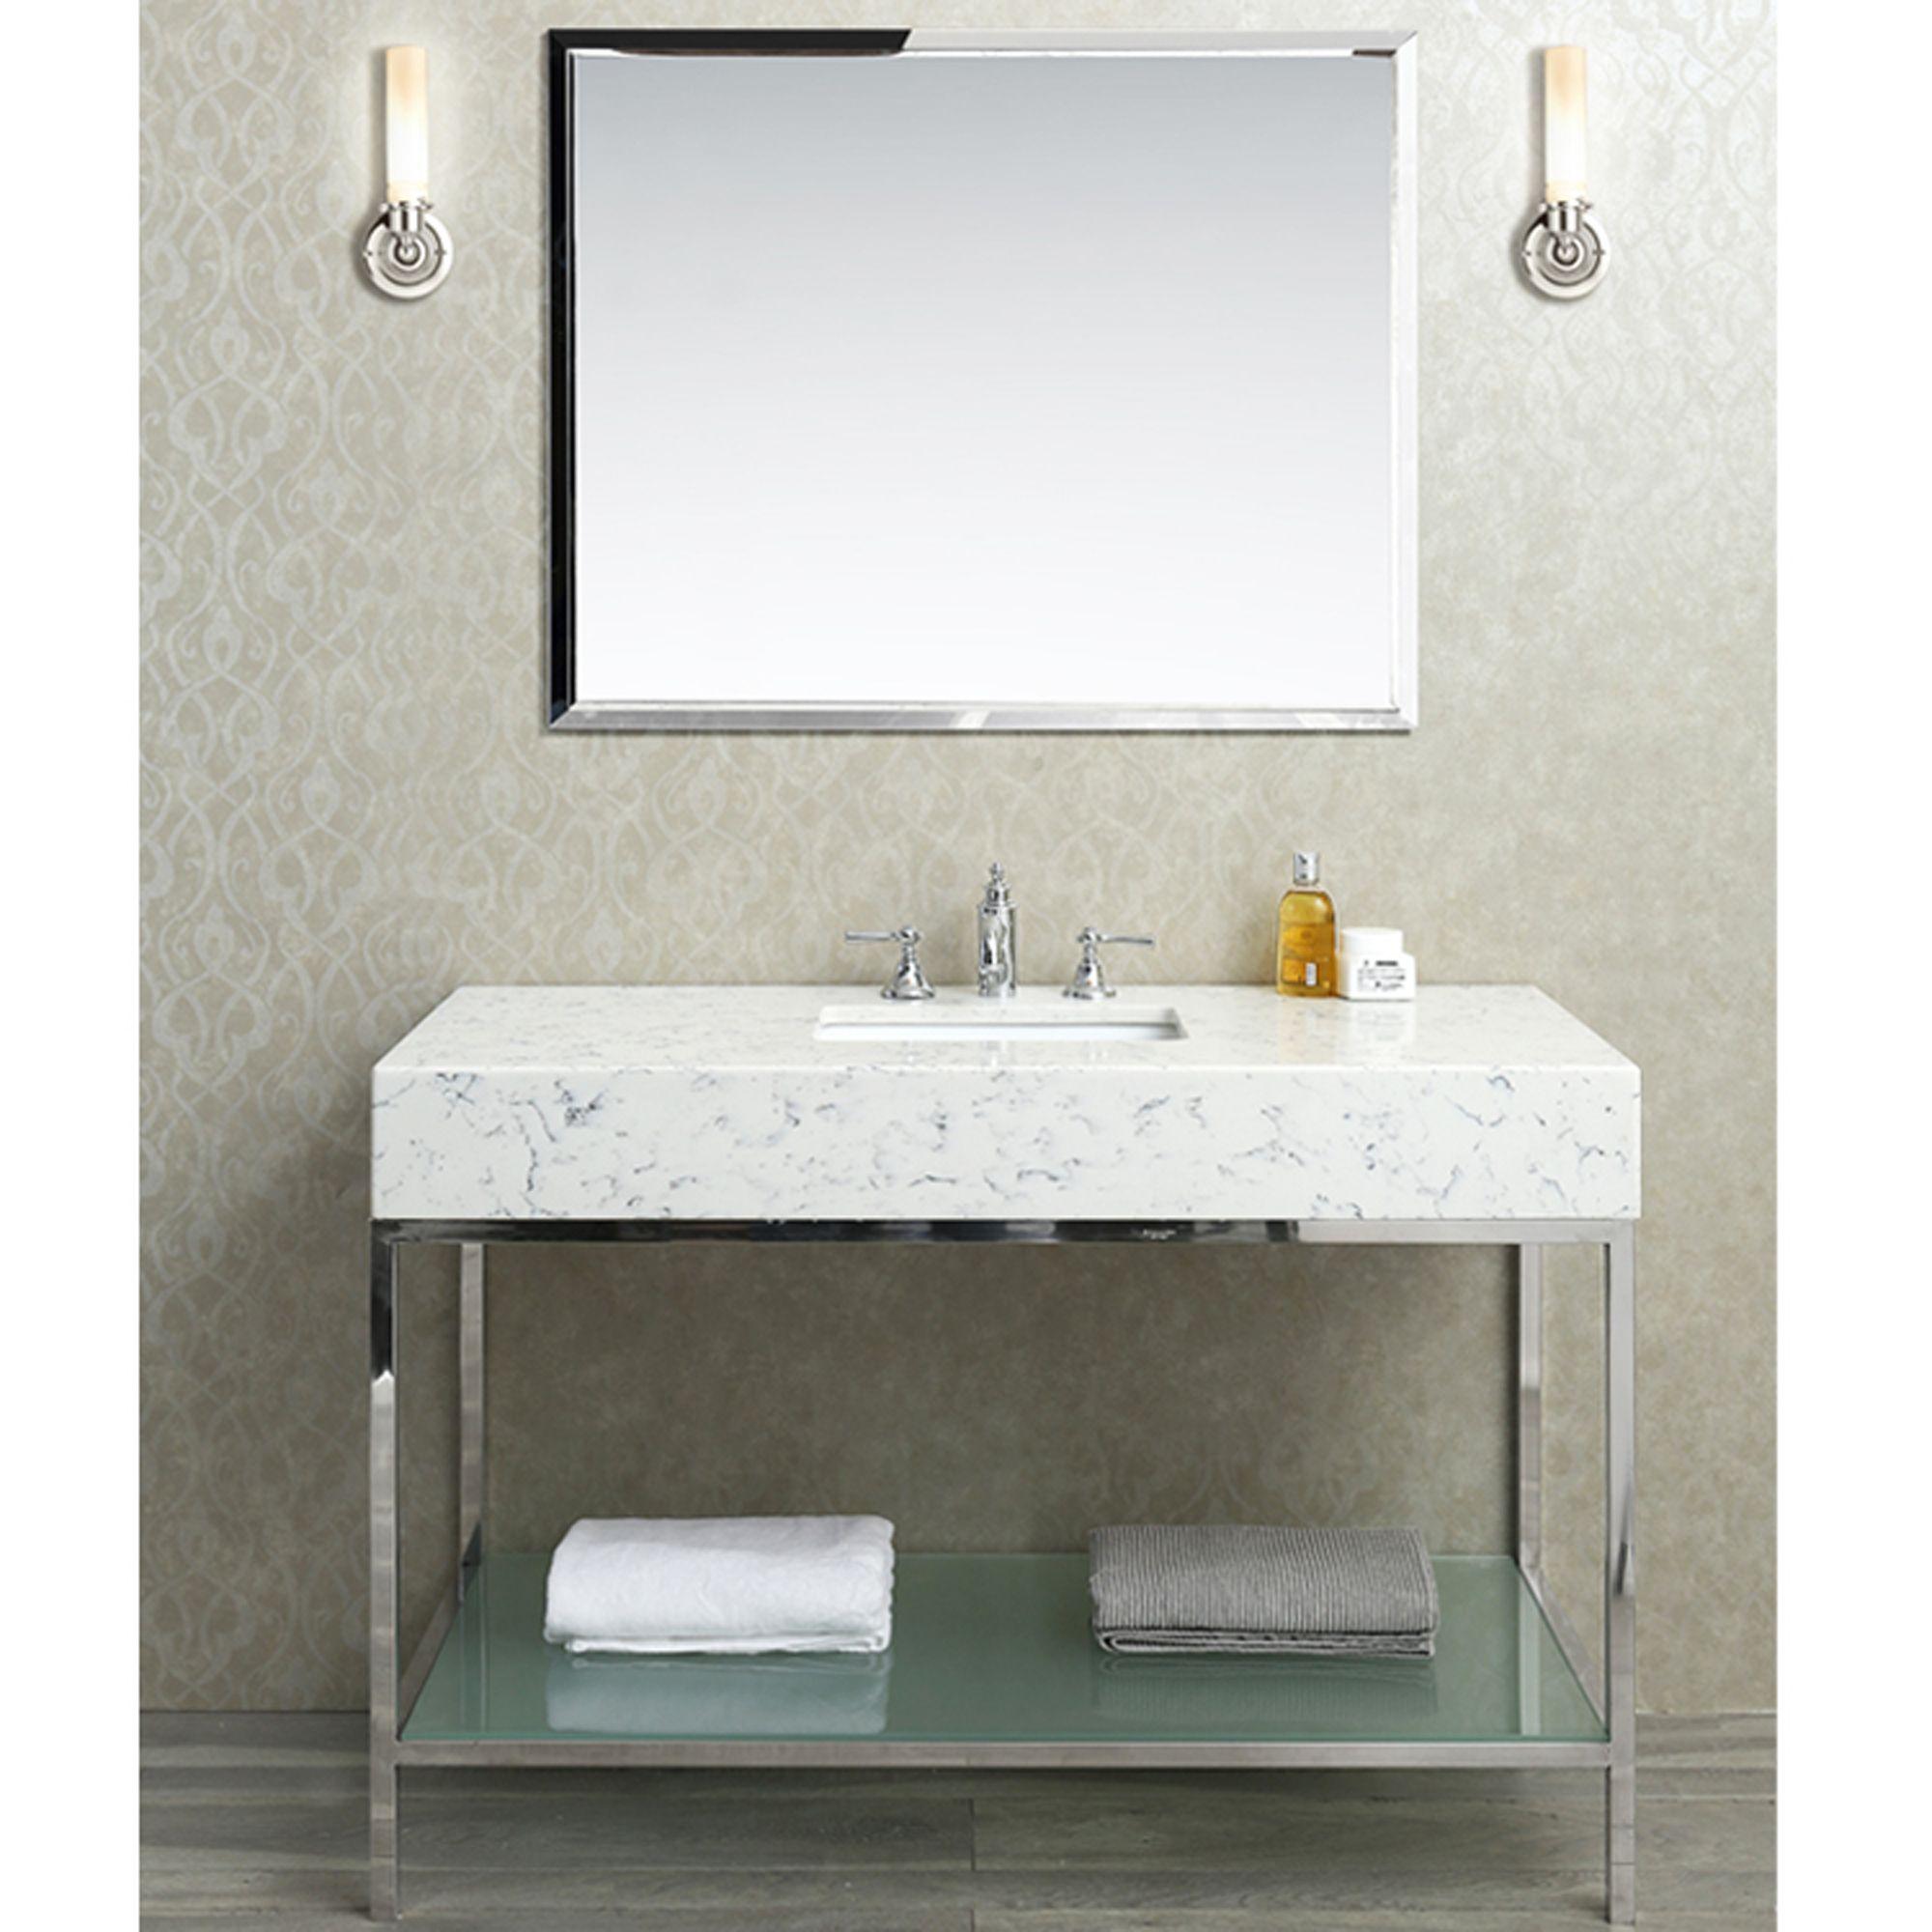 48 Inch Single Sink Bathroom Vanity Set With Quartz Countertop Single Sink Bathroom Vanity Single Sink Vanity Quartz Bathroom Countertops